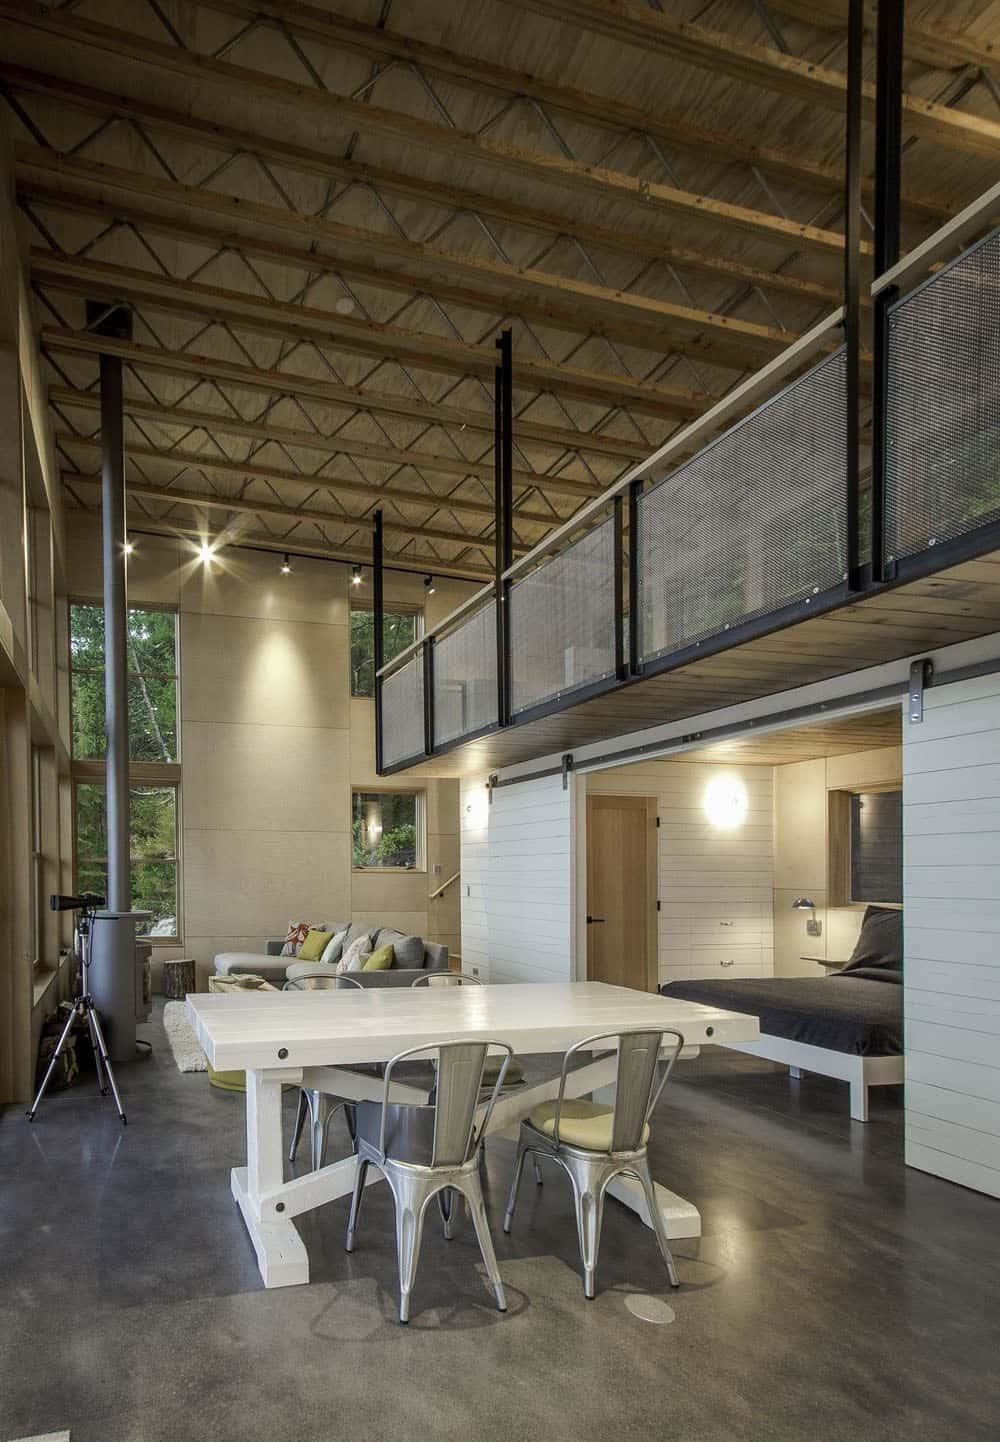 cabin-industrial-dining-room